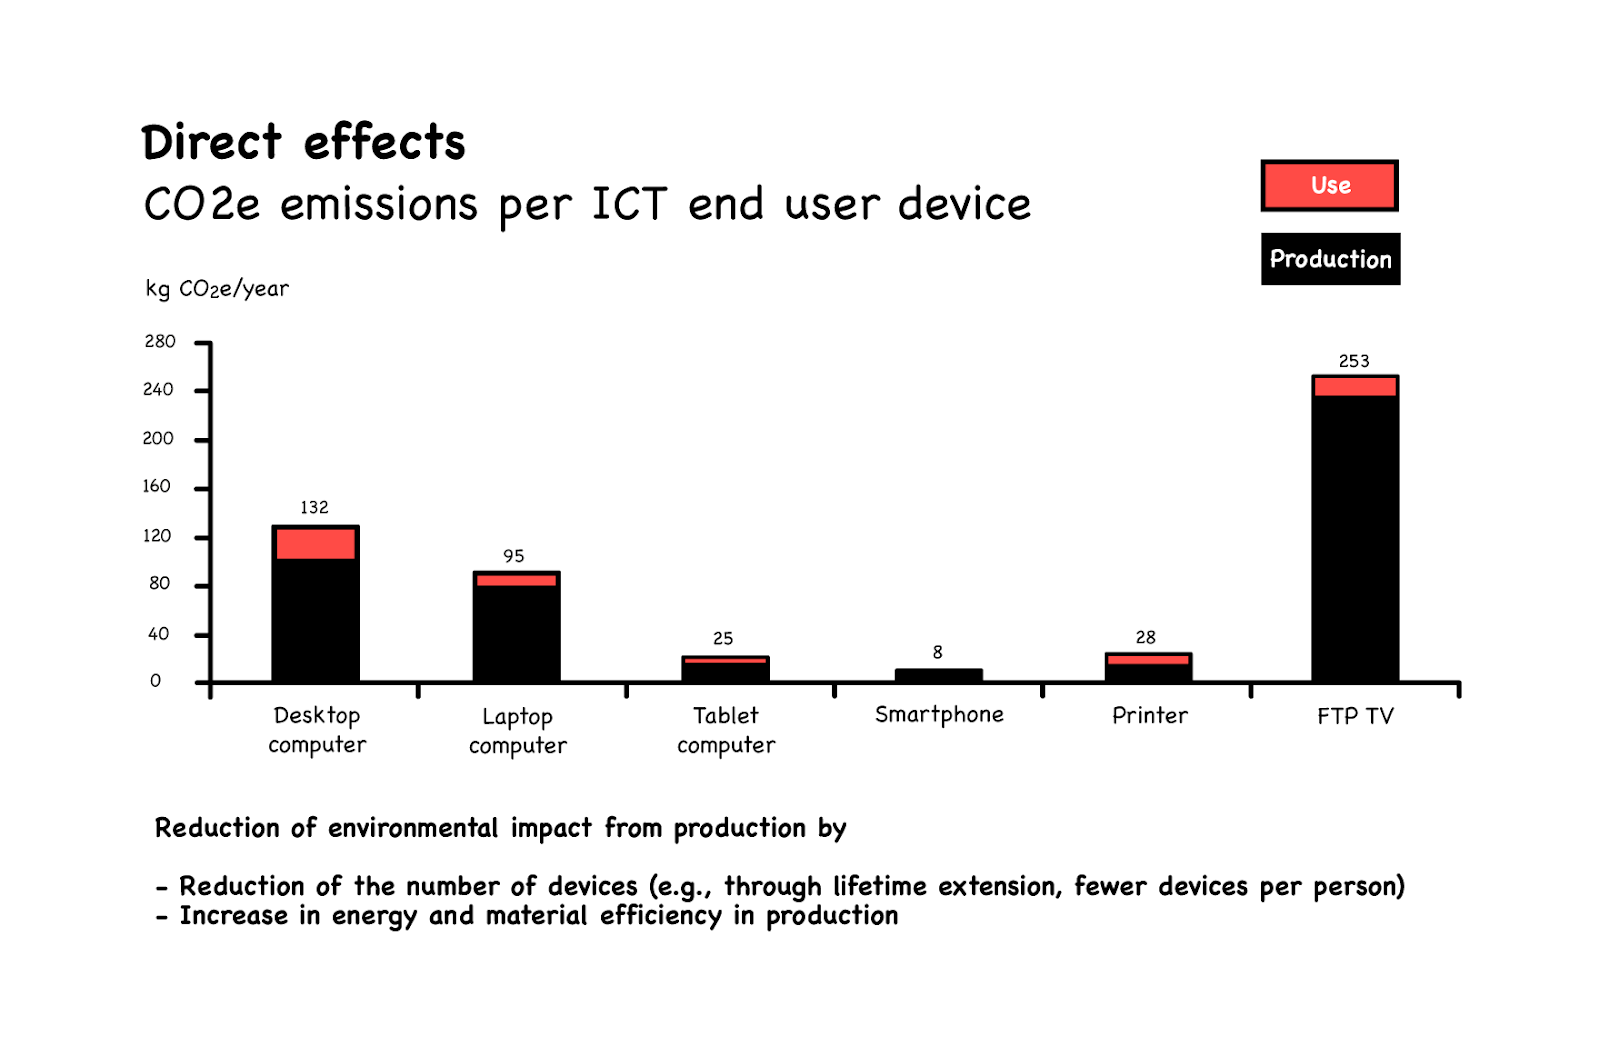 C02e emissions per ICT end user device